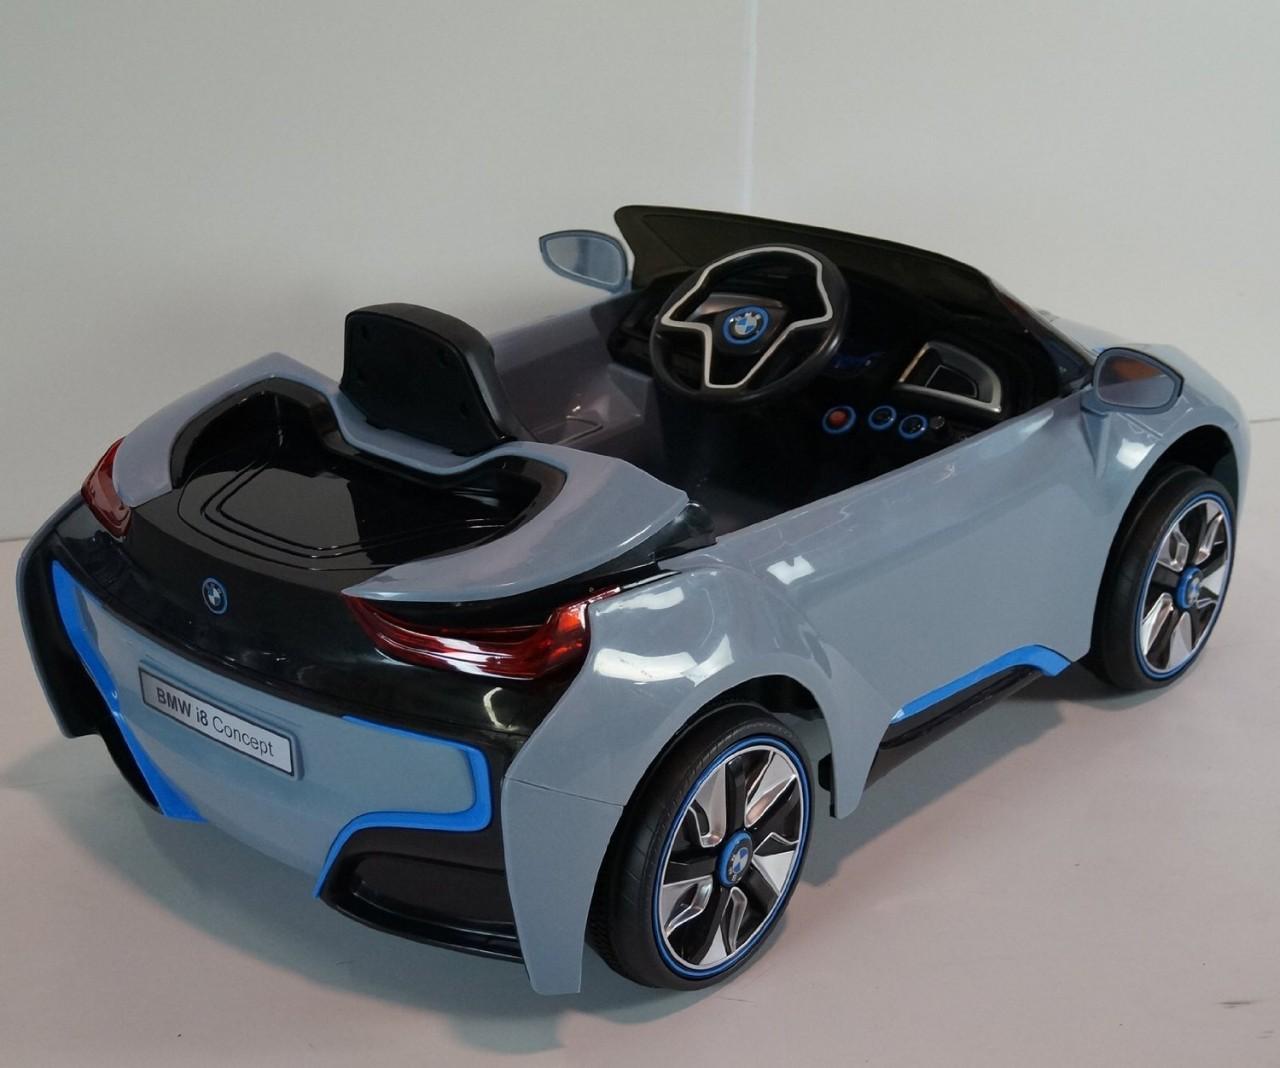 Kids Electric Smart BMW Car Model Je168 Price In Pakistan